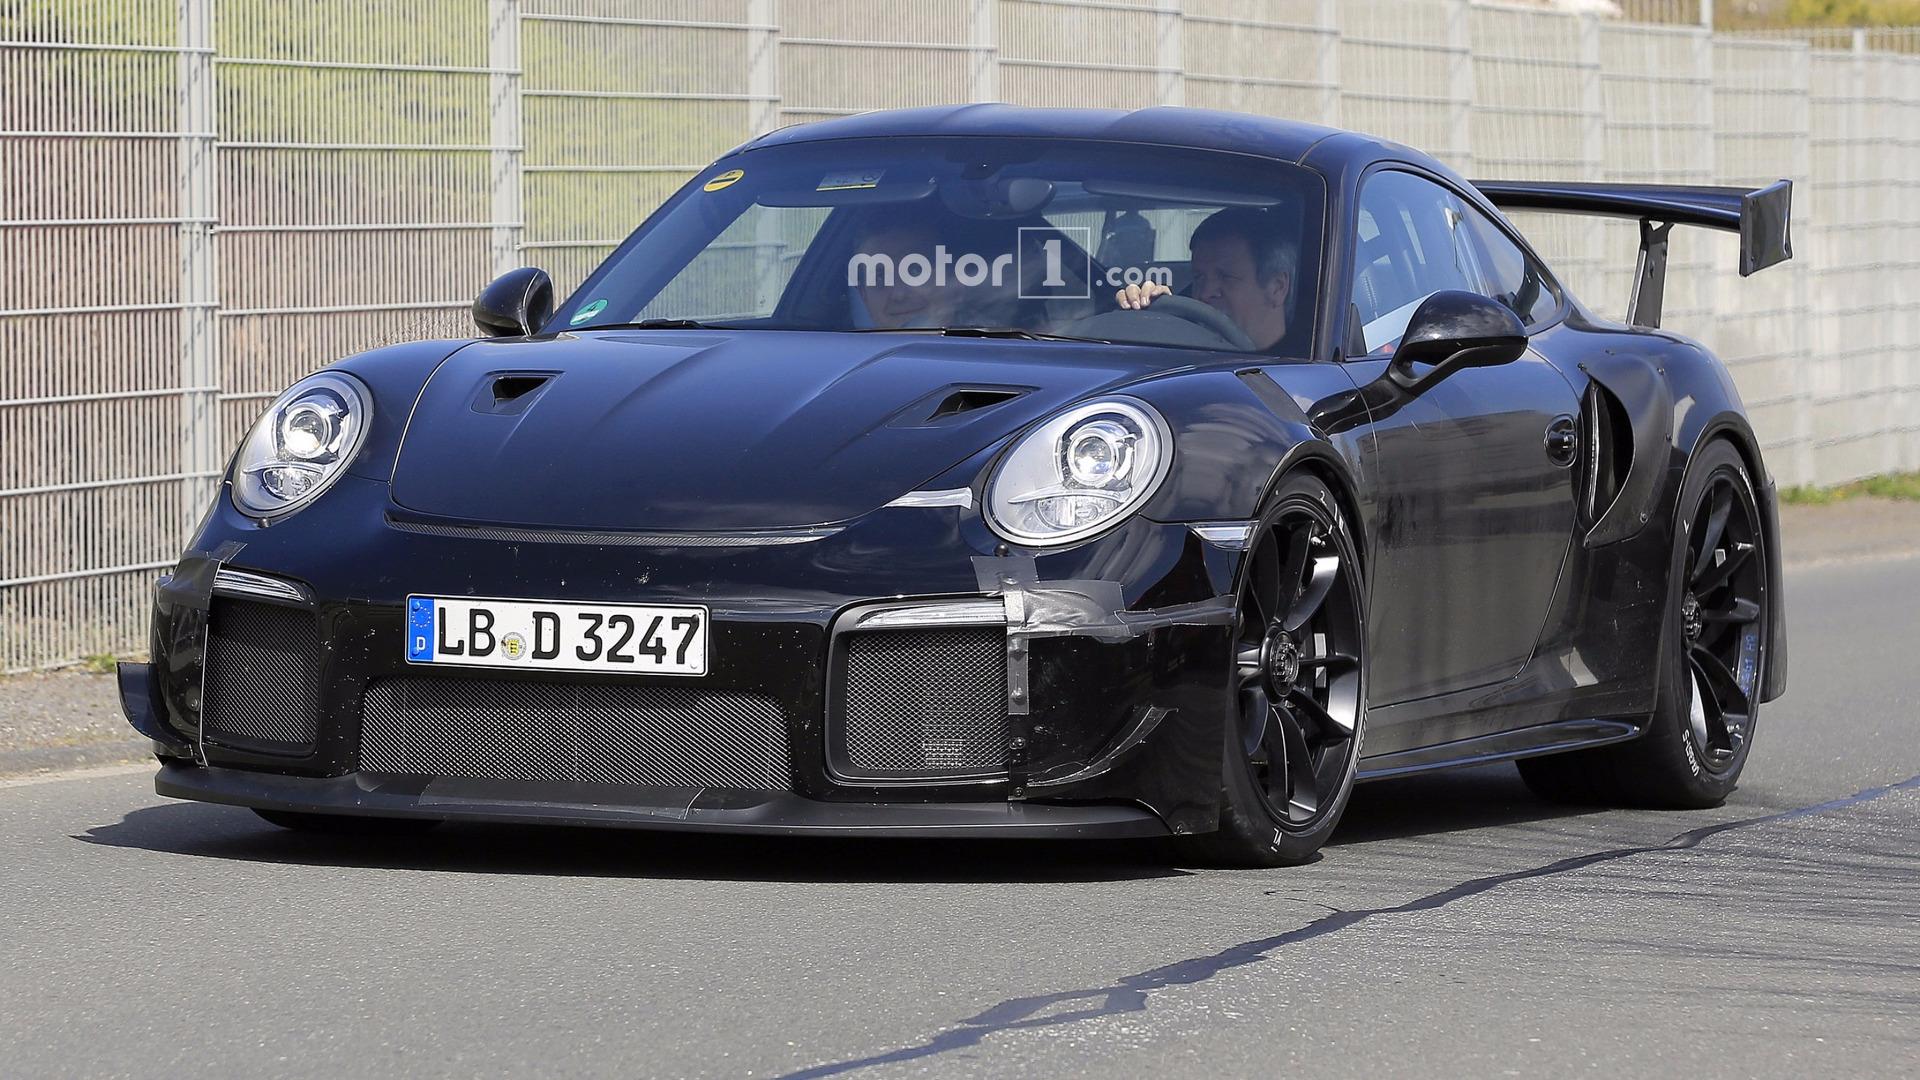 2018-porsche-911-gt2-spy-photo Amazing Porsche 911 Gt2 Rs Engine Cars Trend